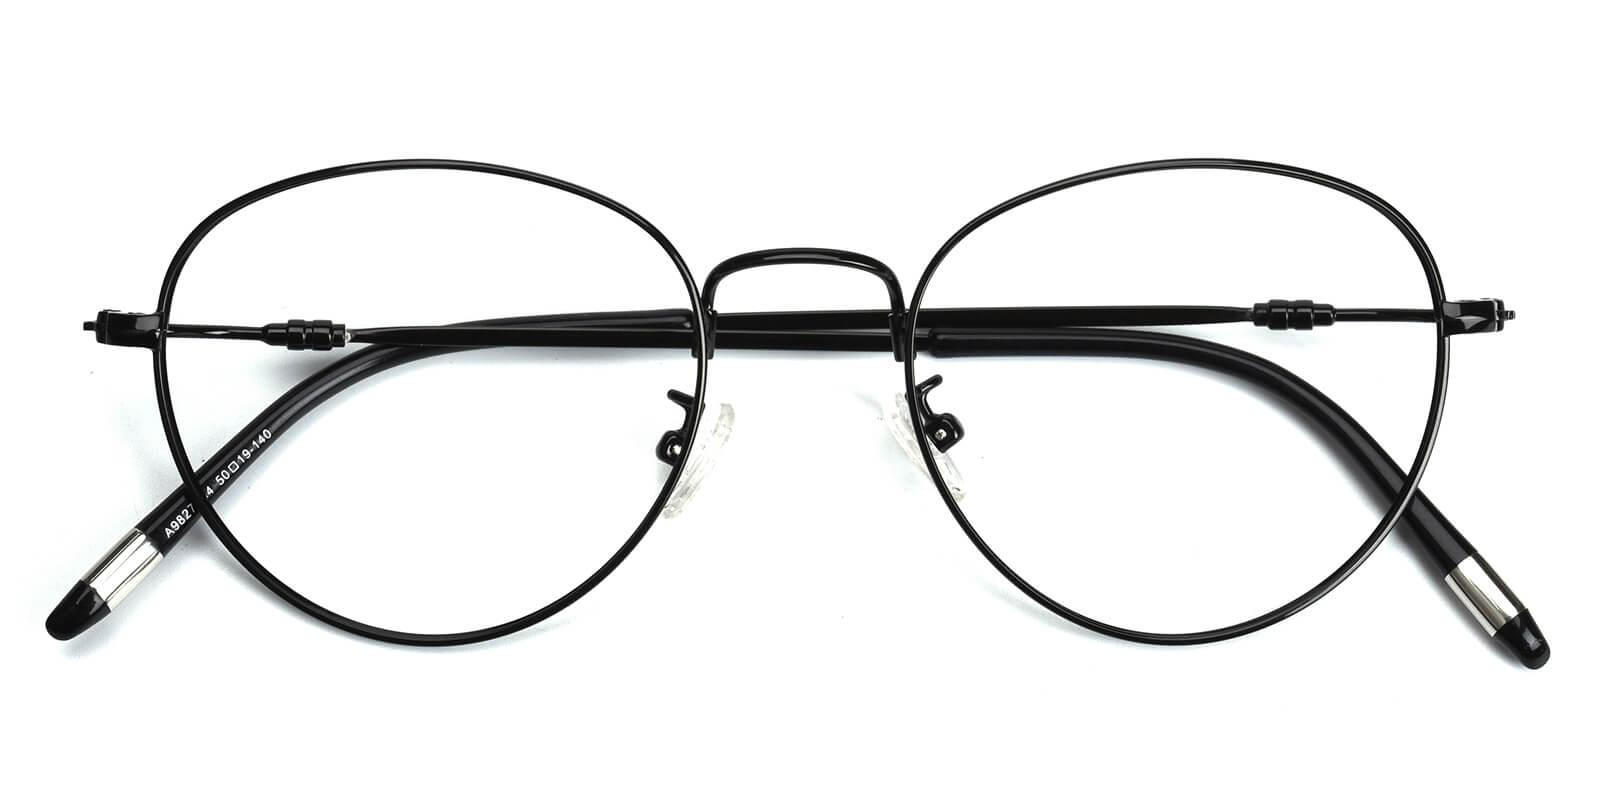 Sadie-Black-Round-Metal-Eyeglasses-detail